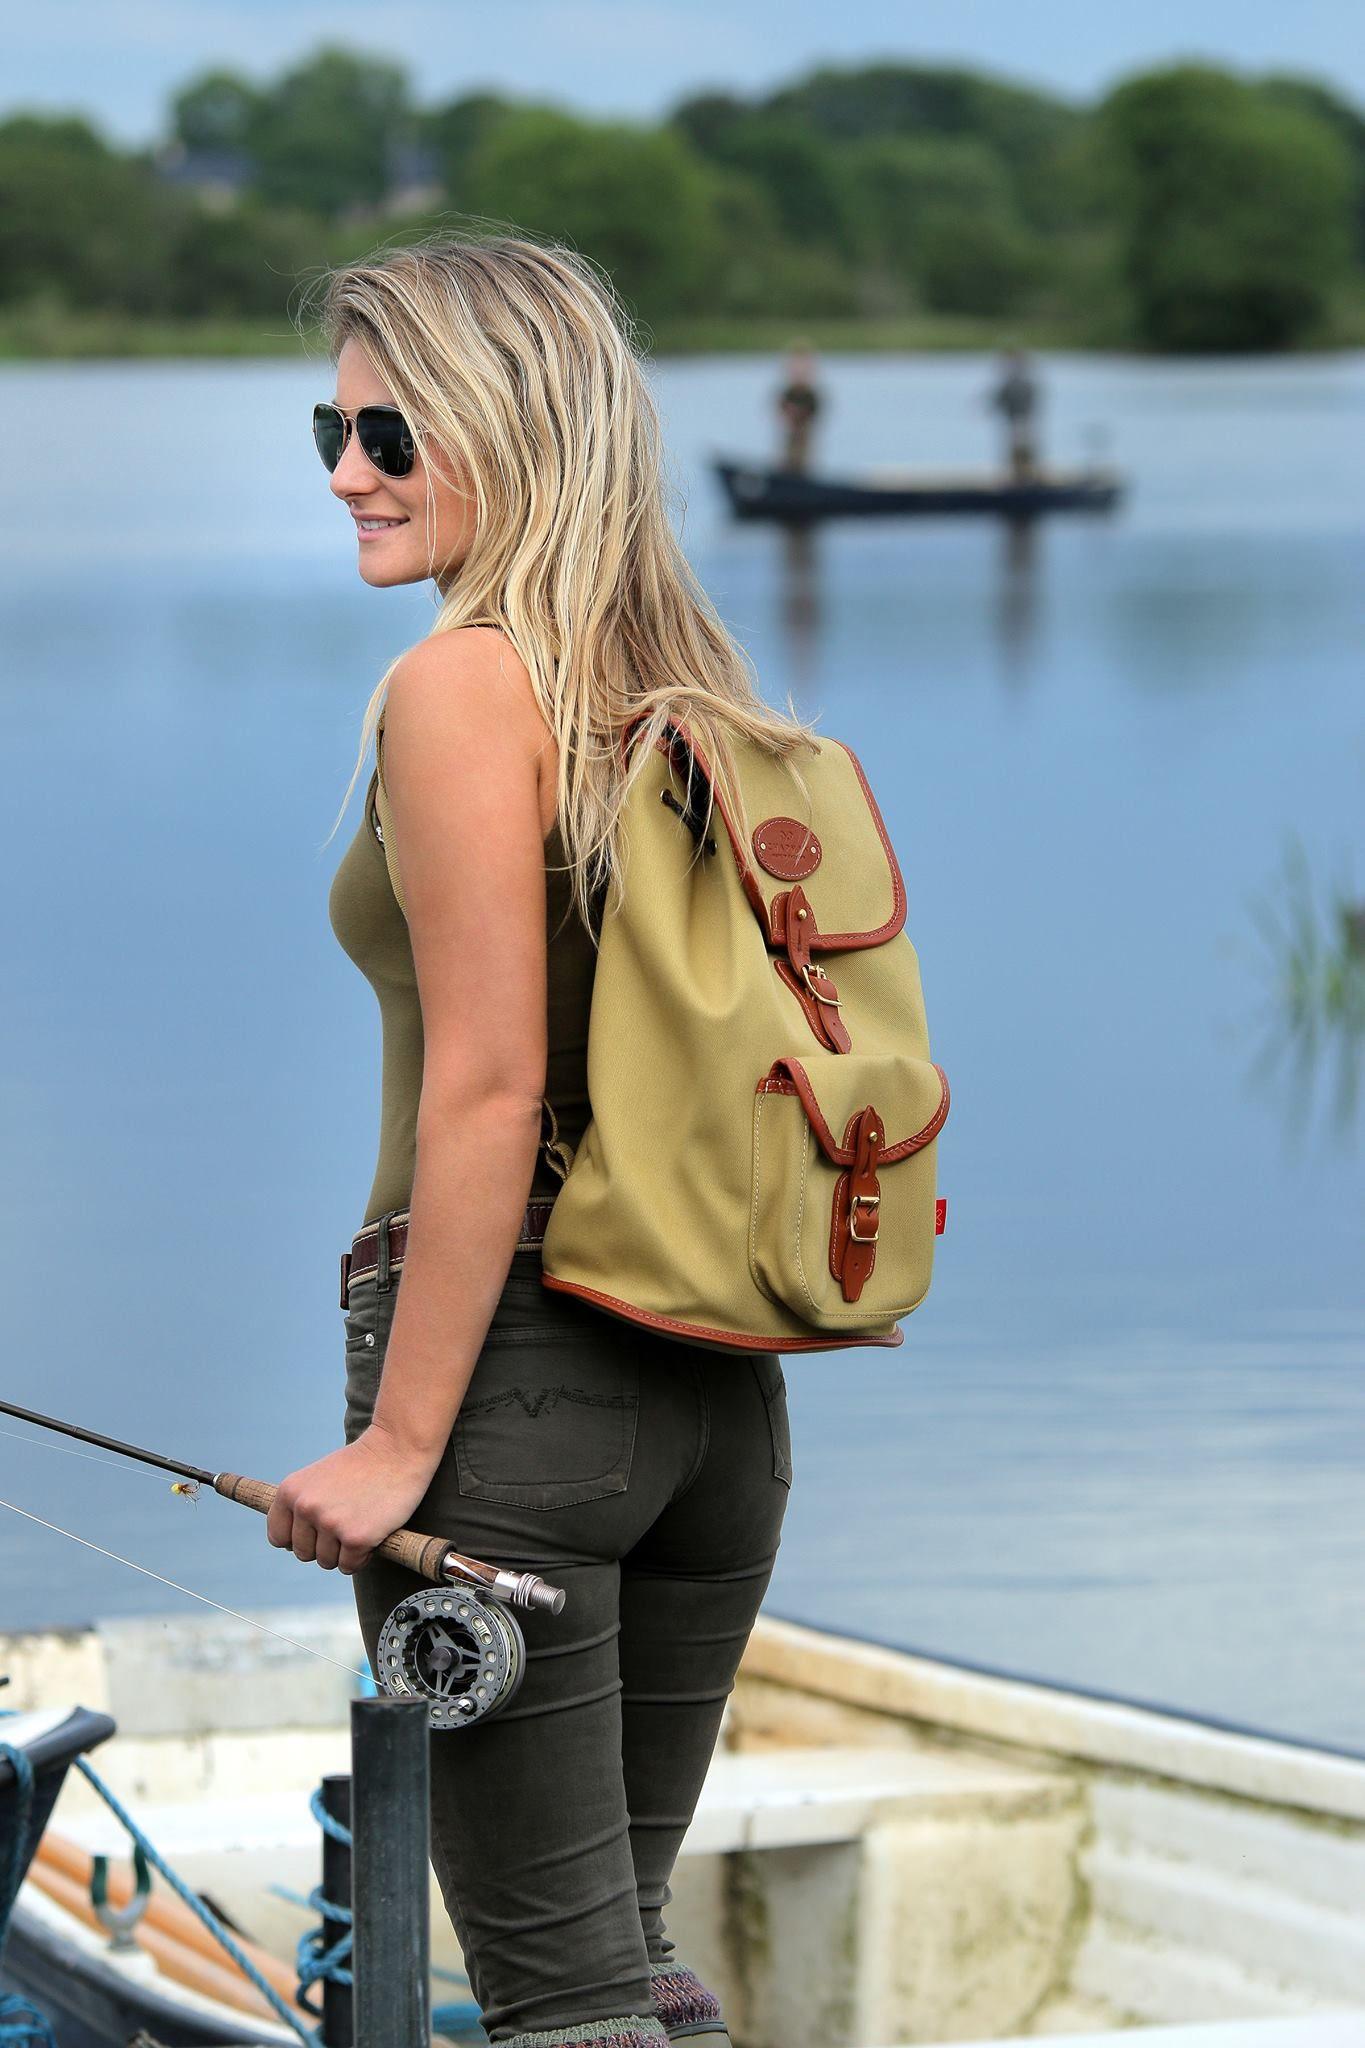 b3ab0d2769ec1 Fly Fishing Enthusiast   Chapman Brand Ambassador Marina Gibson - Sporting the  Classic Border Rucksack